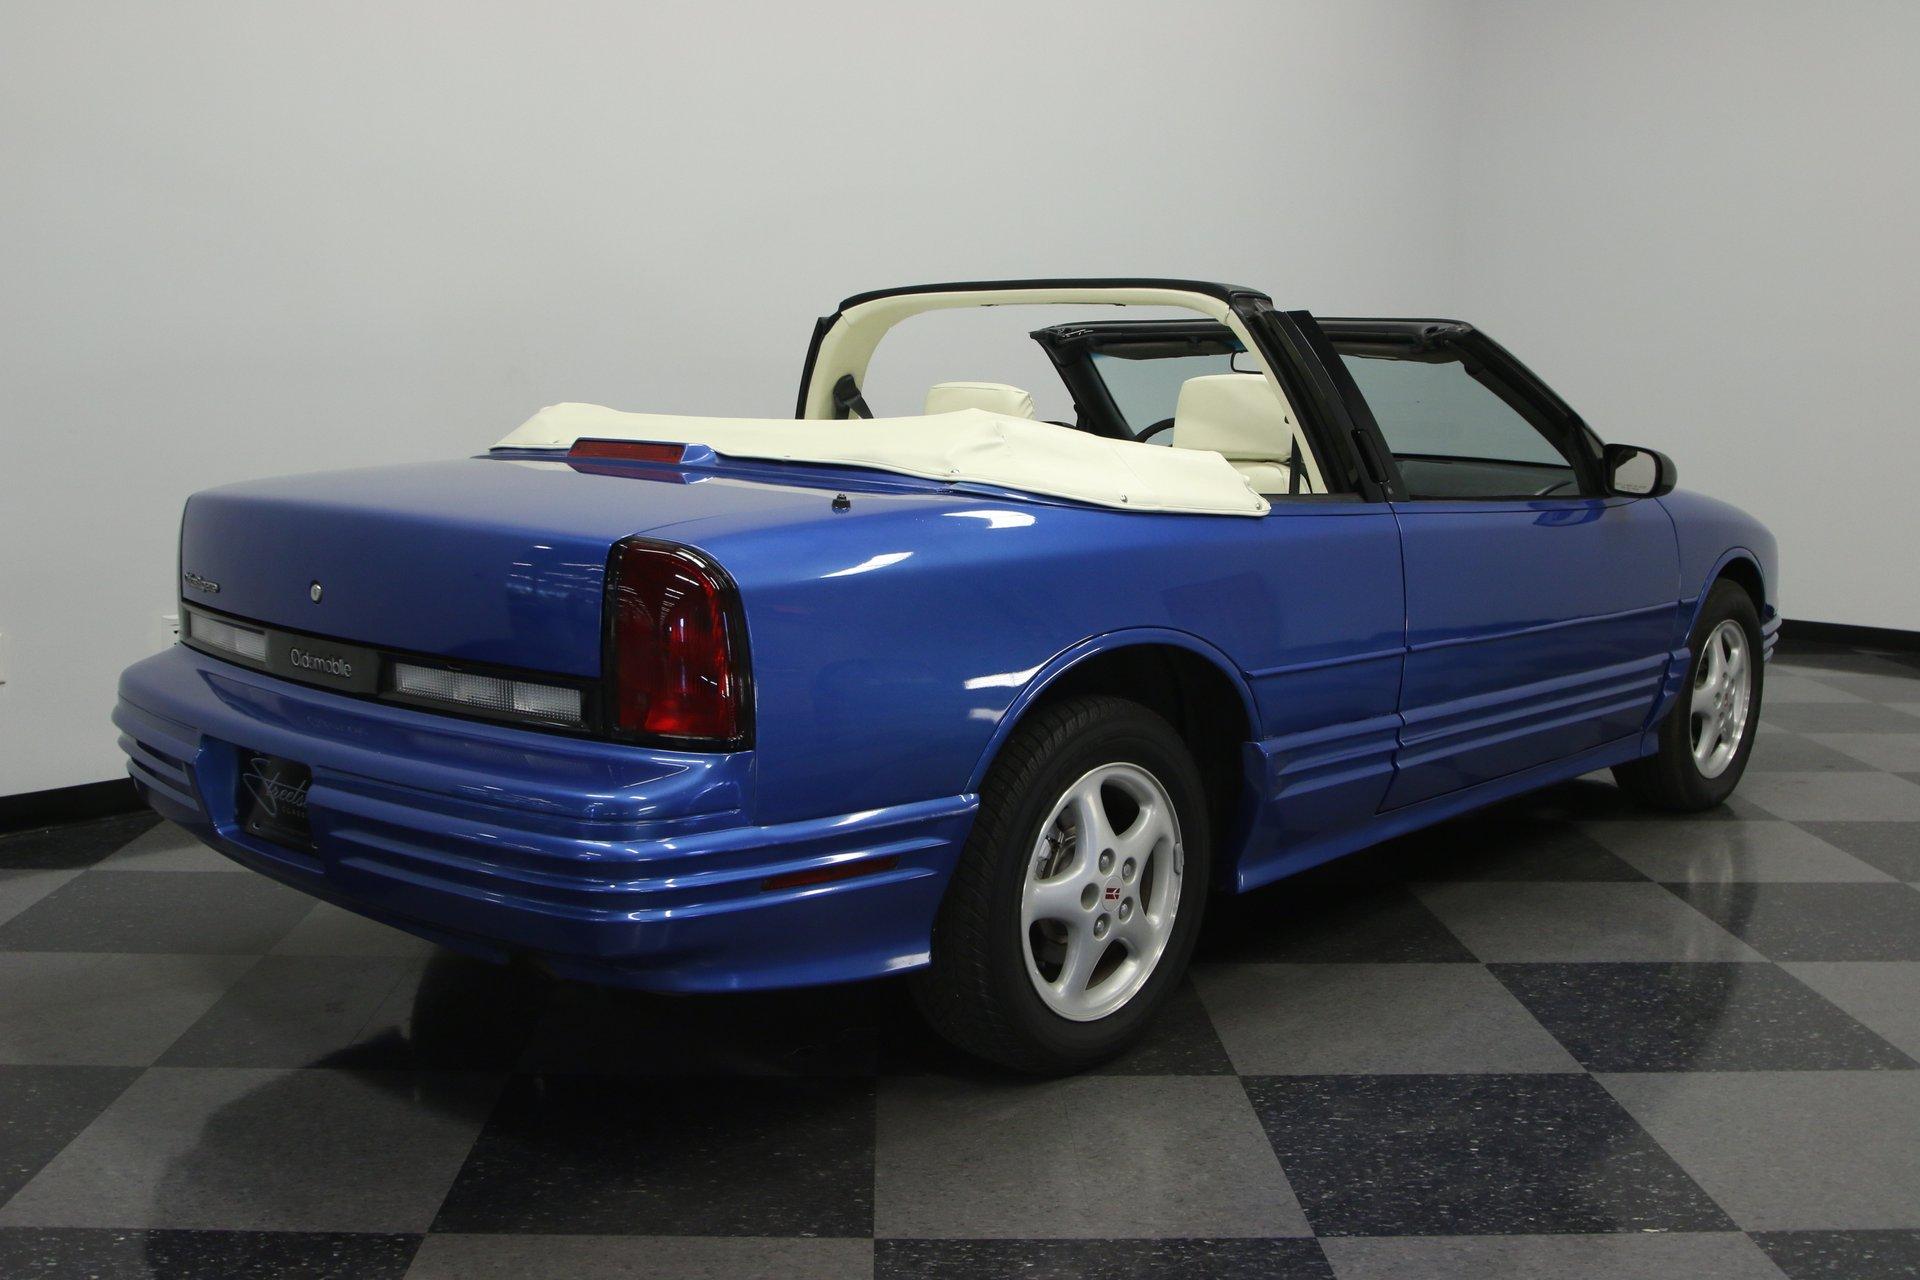 95 olds cutlass supreme convertible